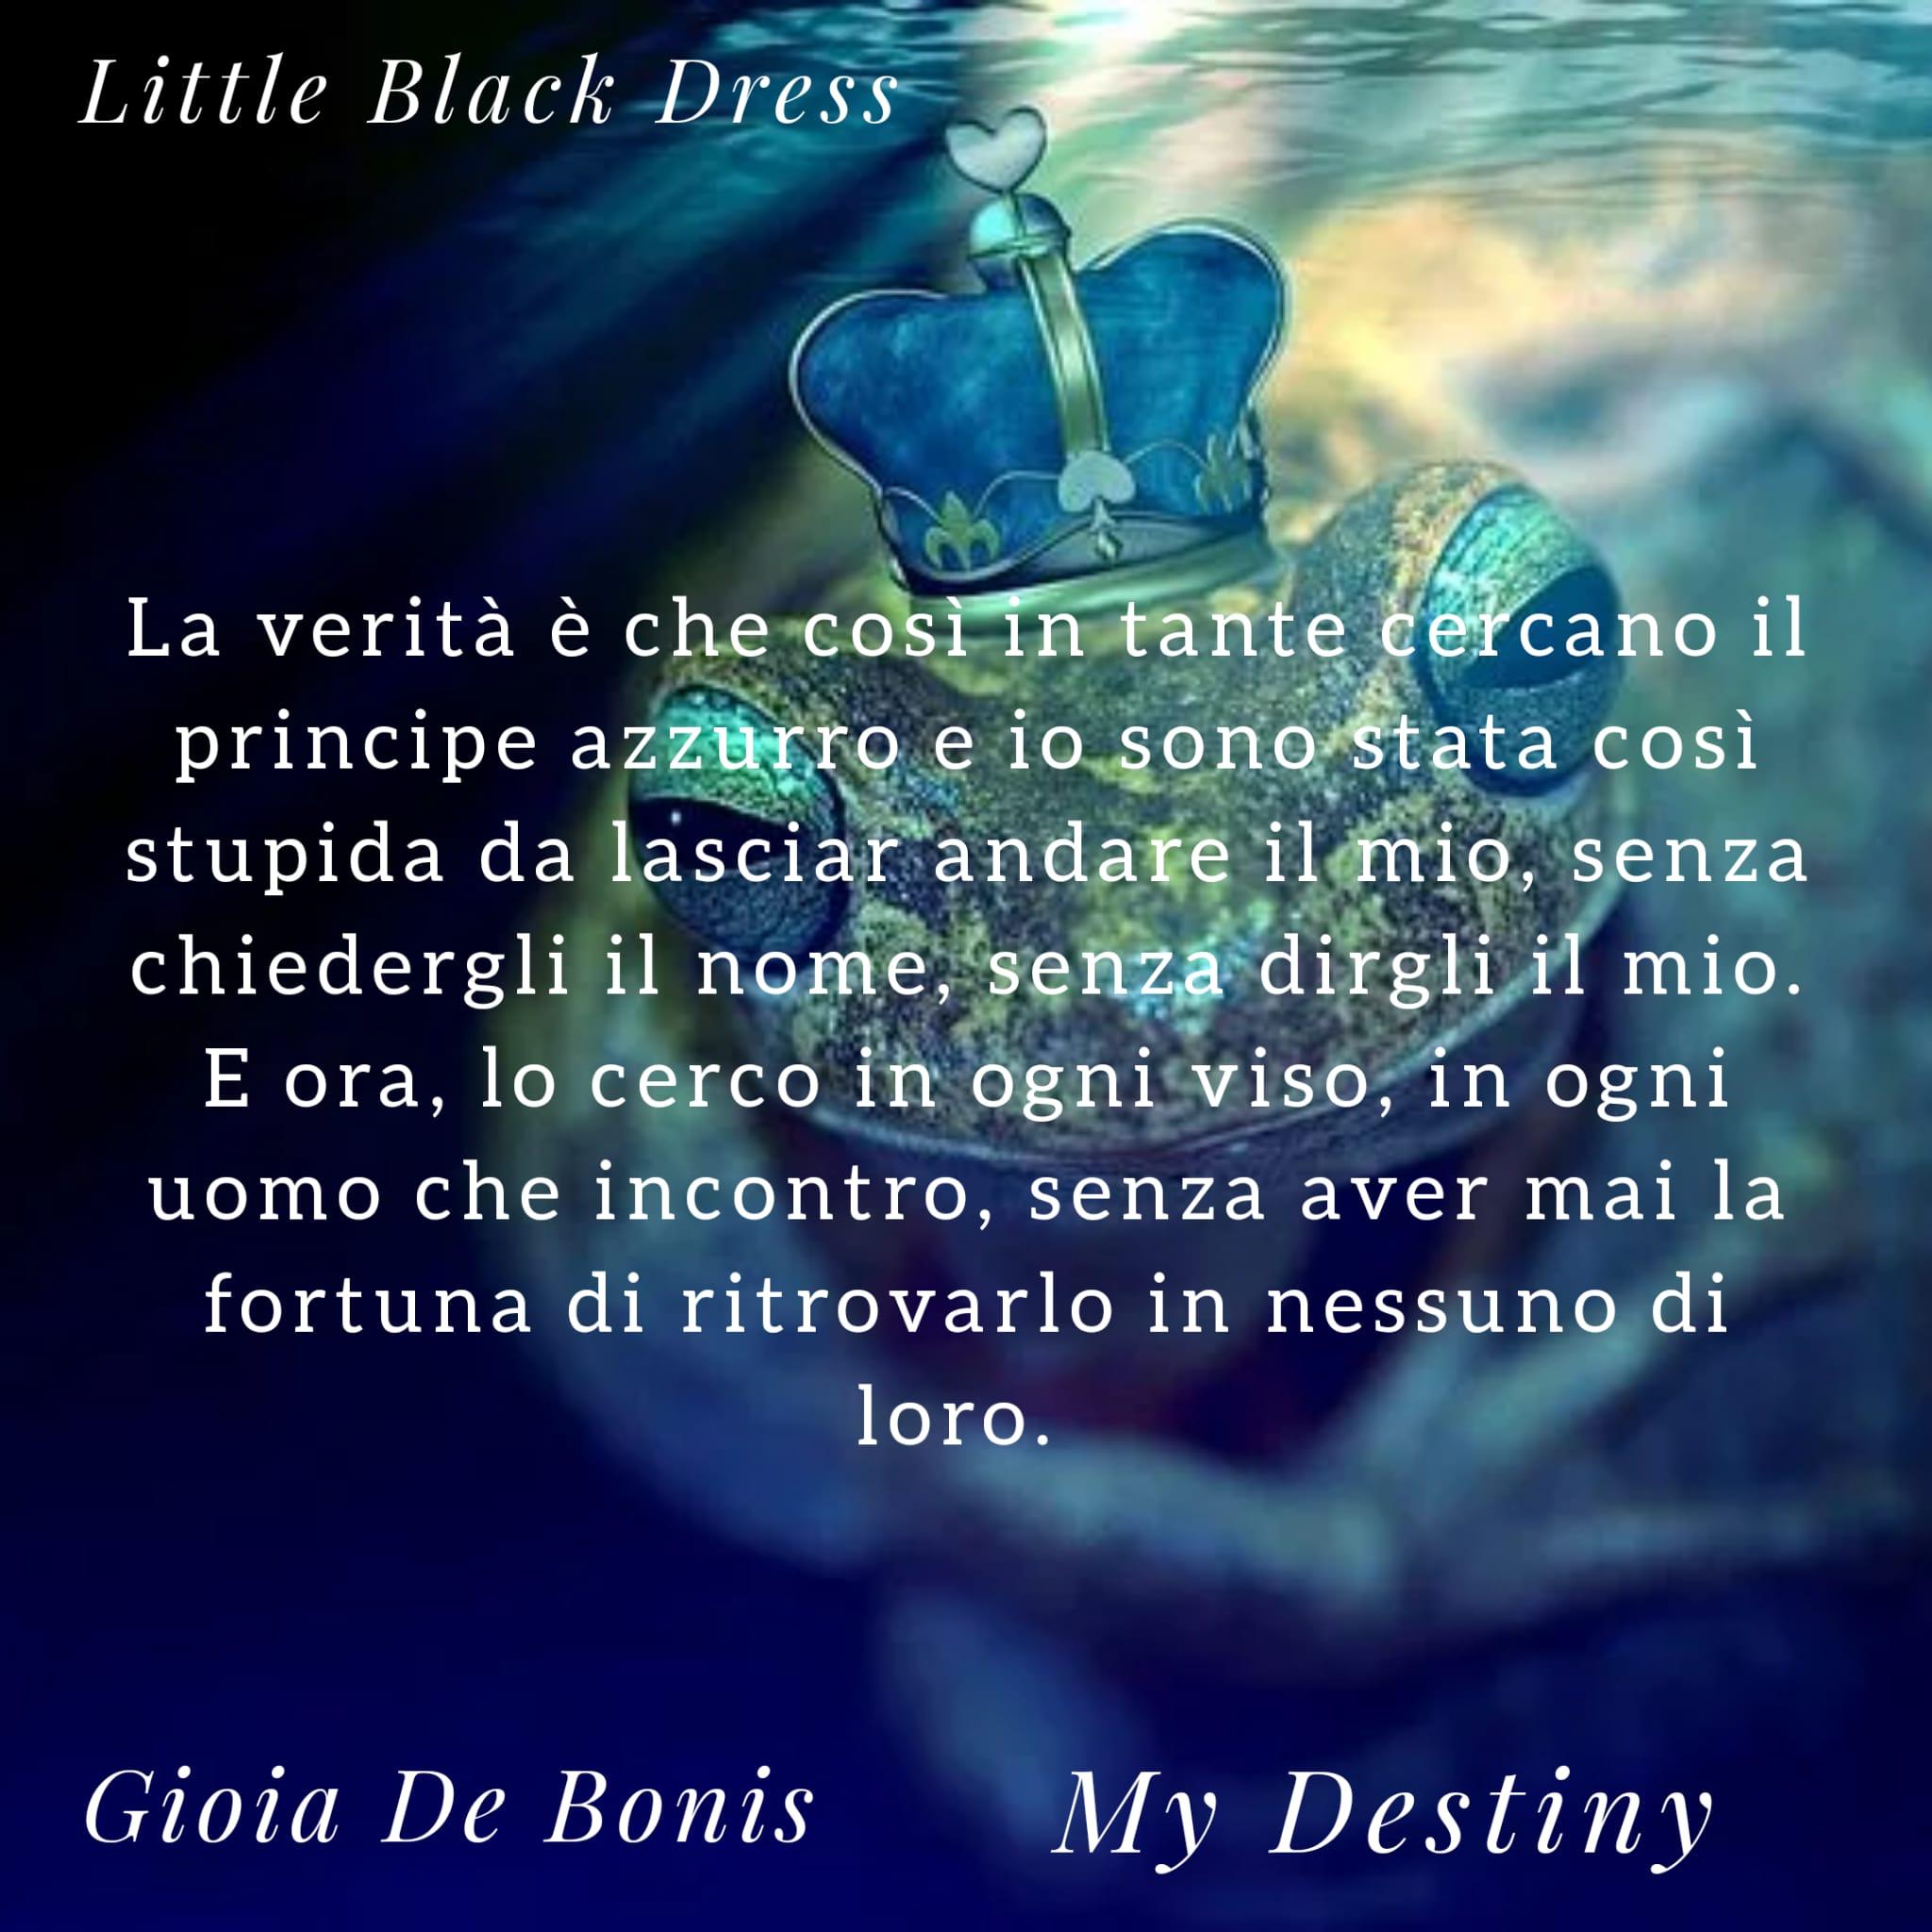 My Destiny - Bianca